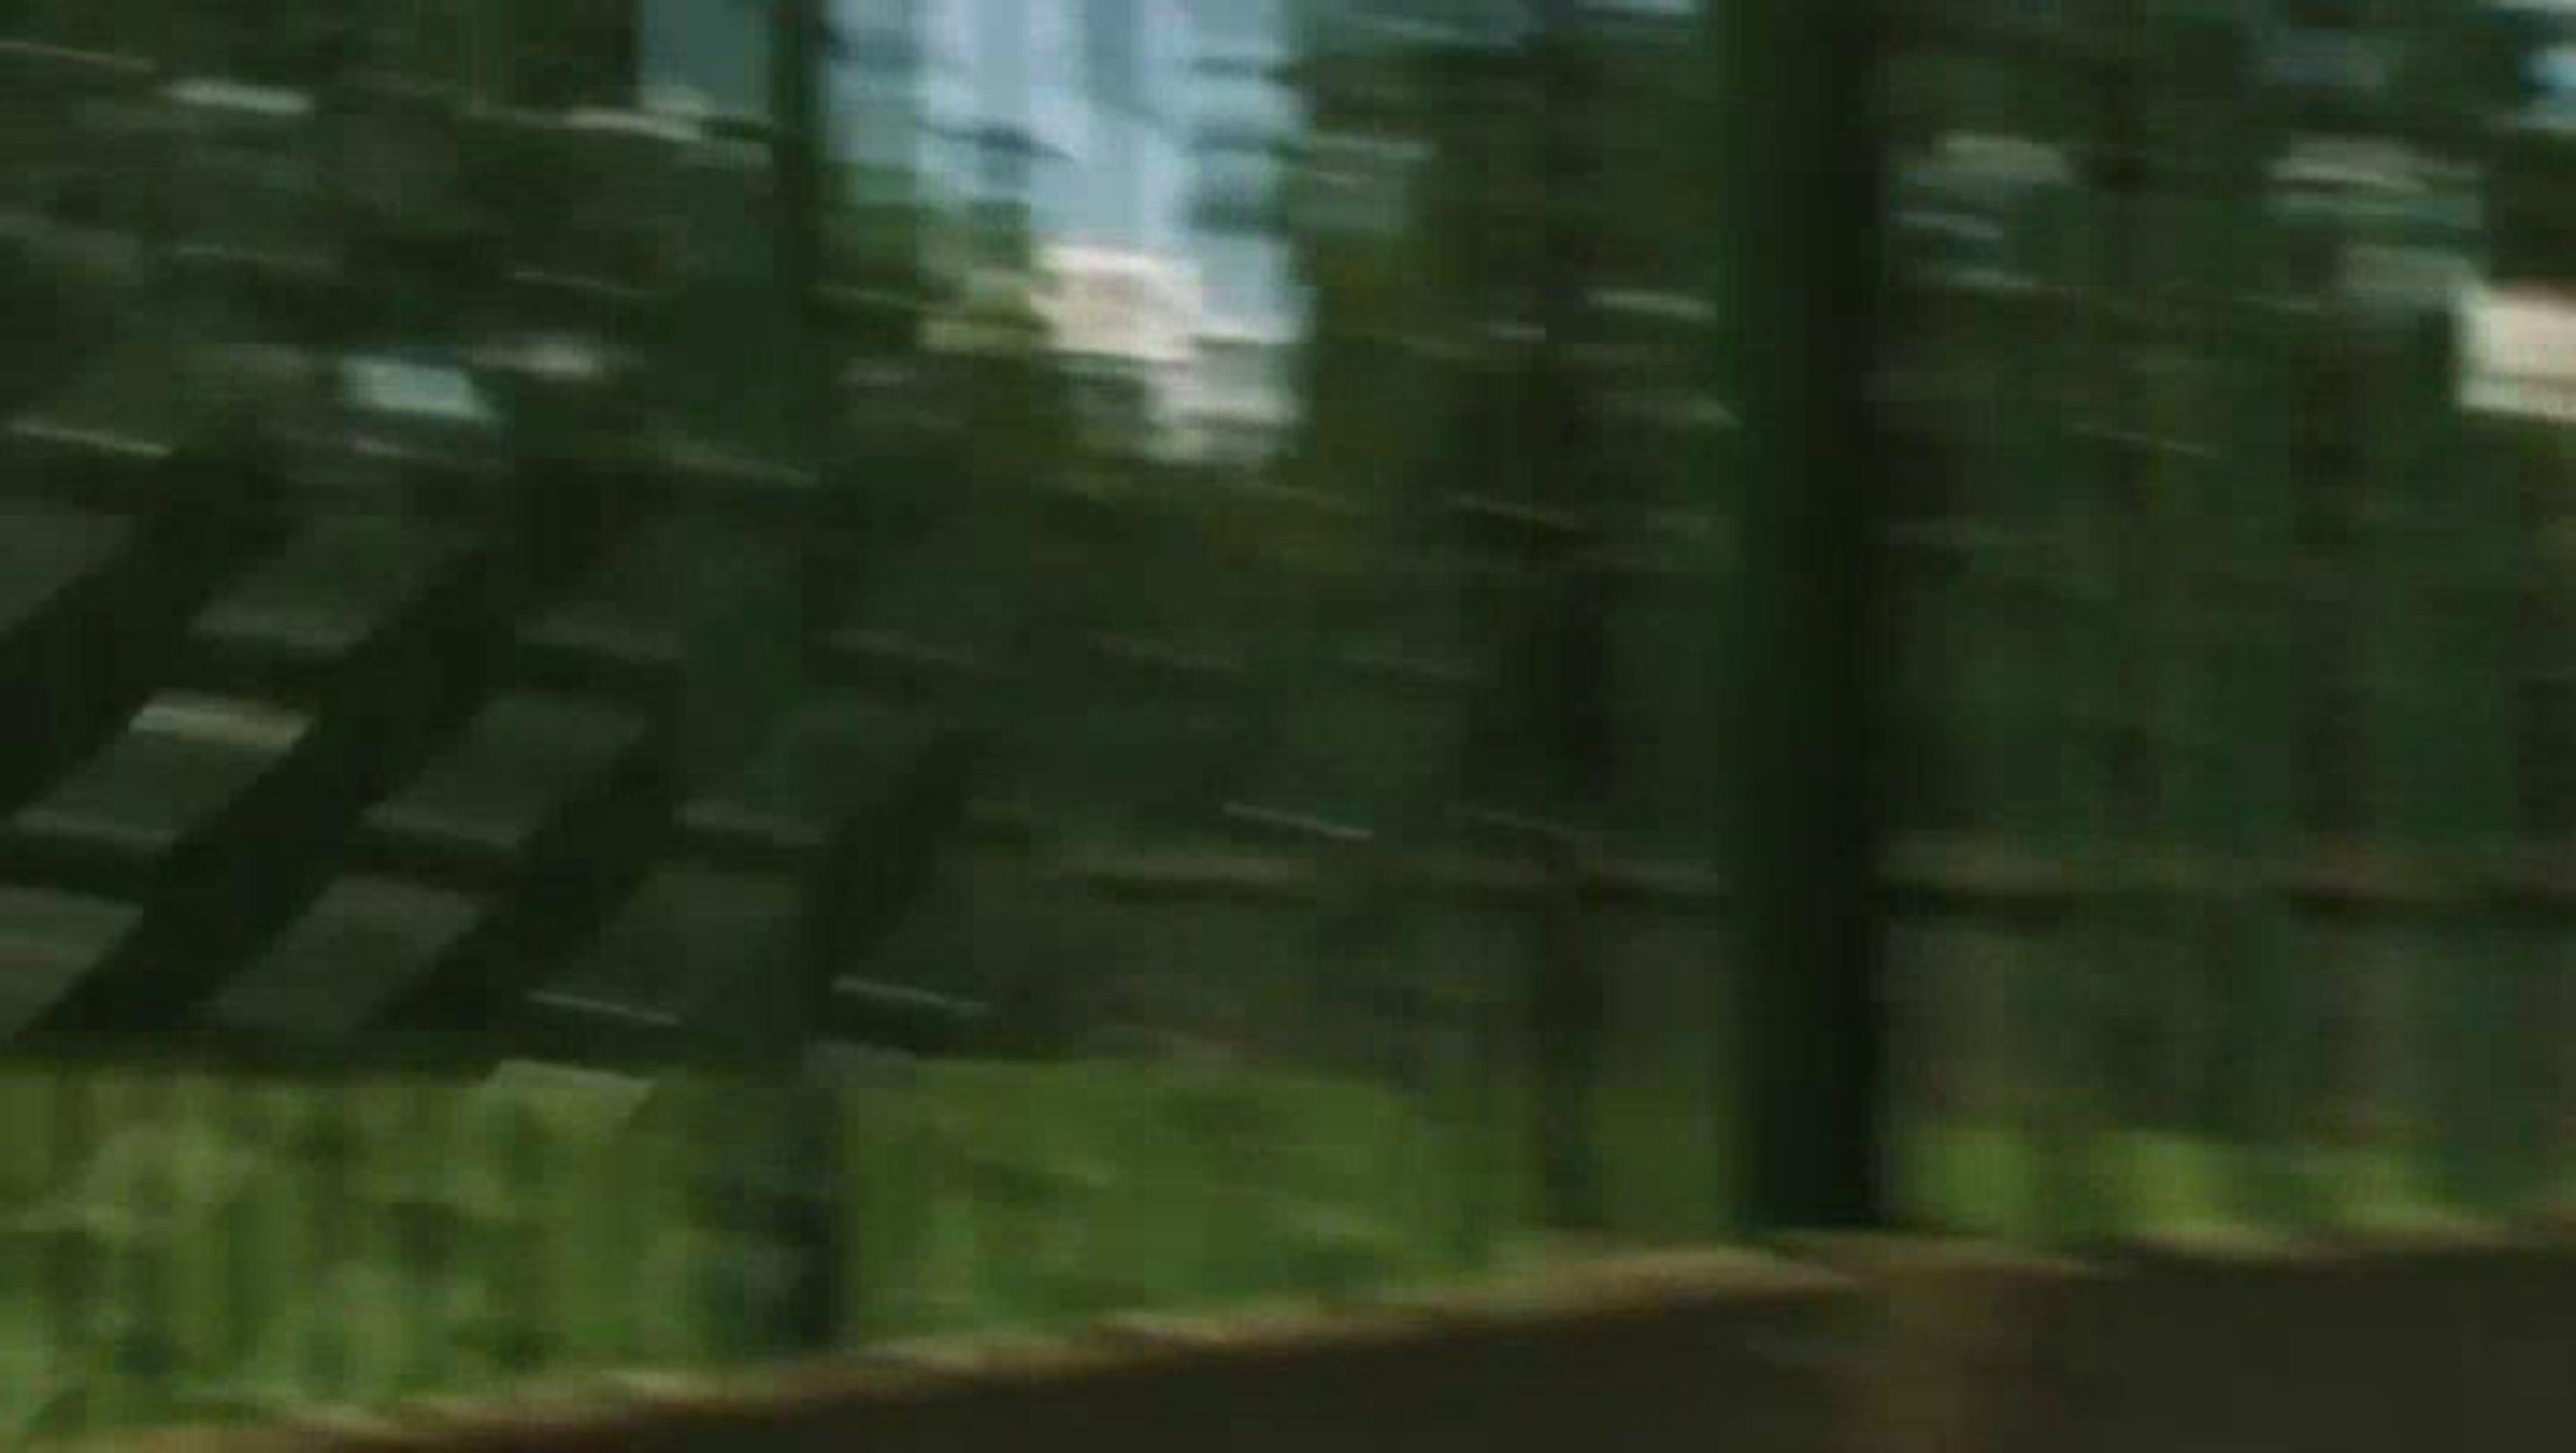 The dead inside - das böse vergisst nie trailer